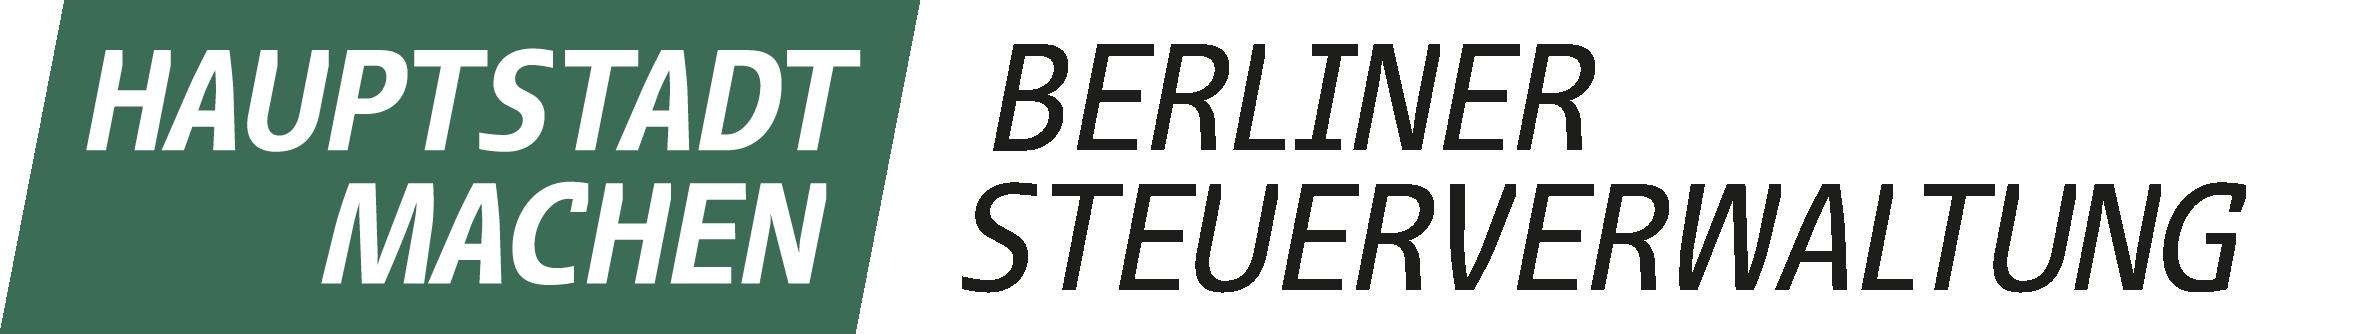 Berliner Steuerverwaltung